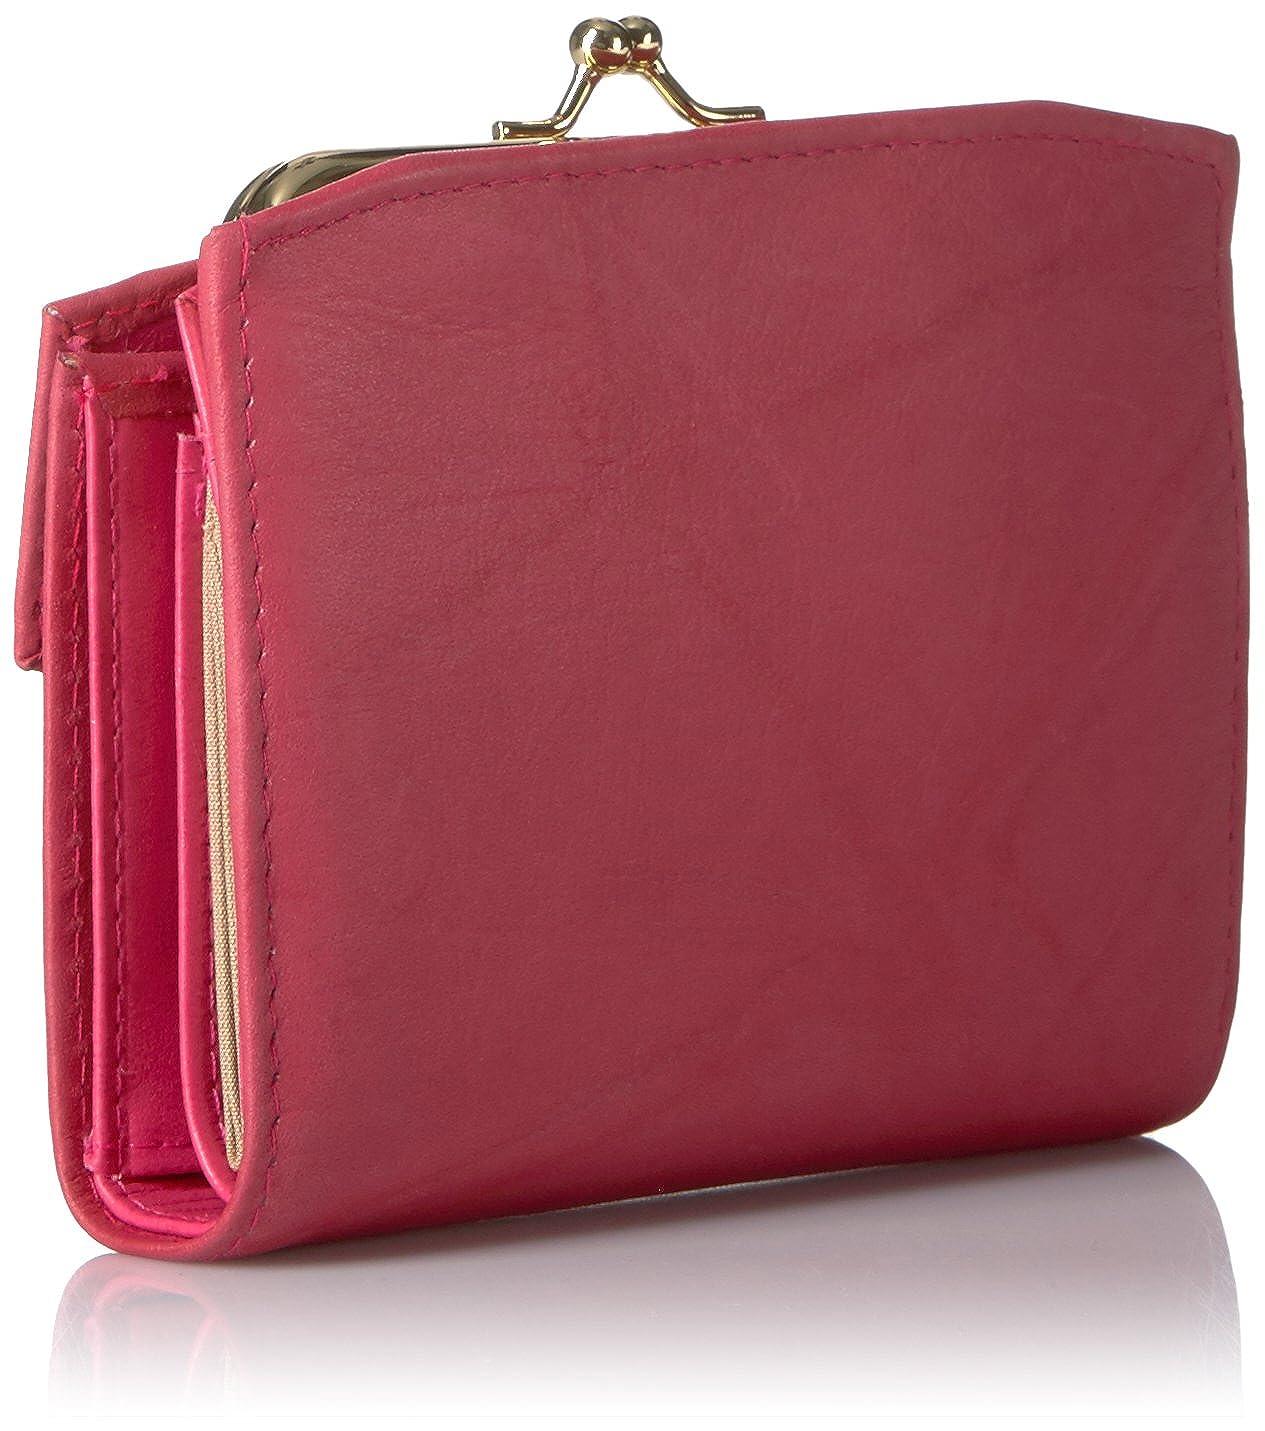 Buxton - Cartera para Hombre Mujer Rosa Coral Talla única: Amazon.es: Equipaje